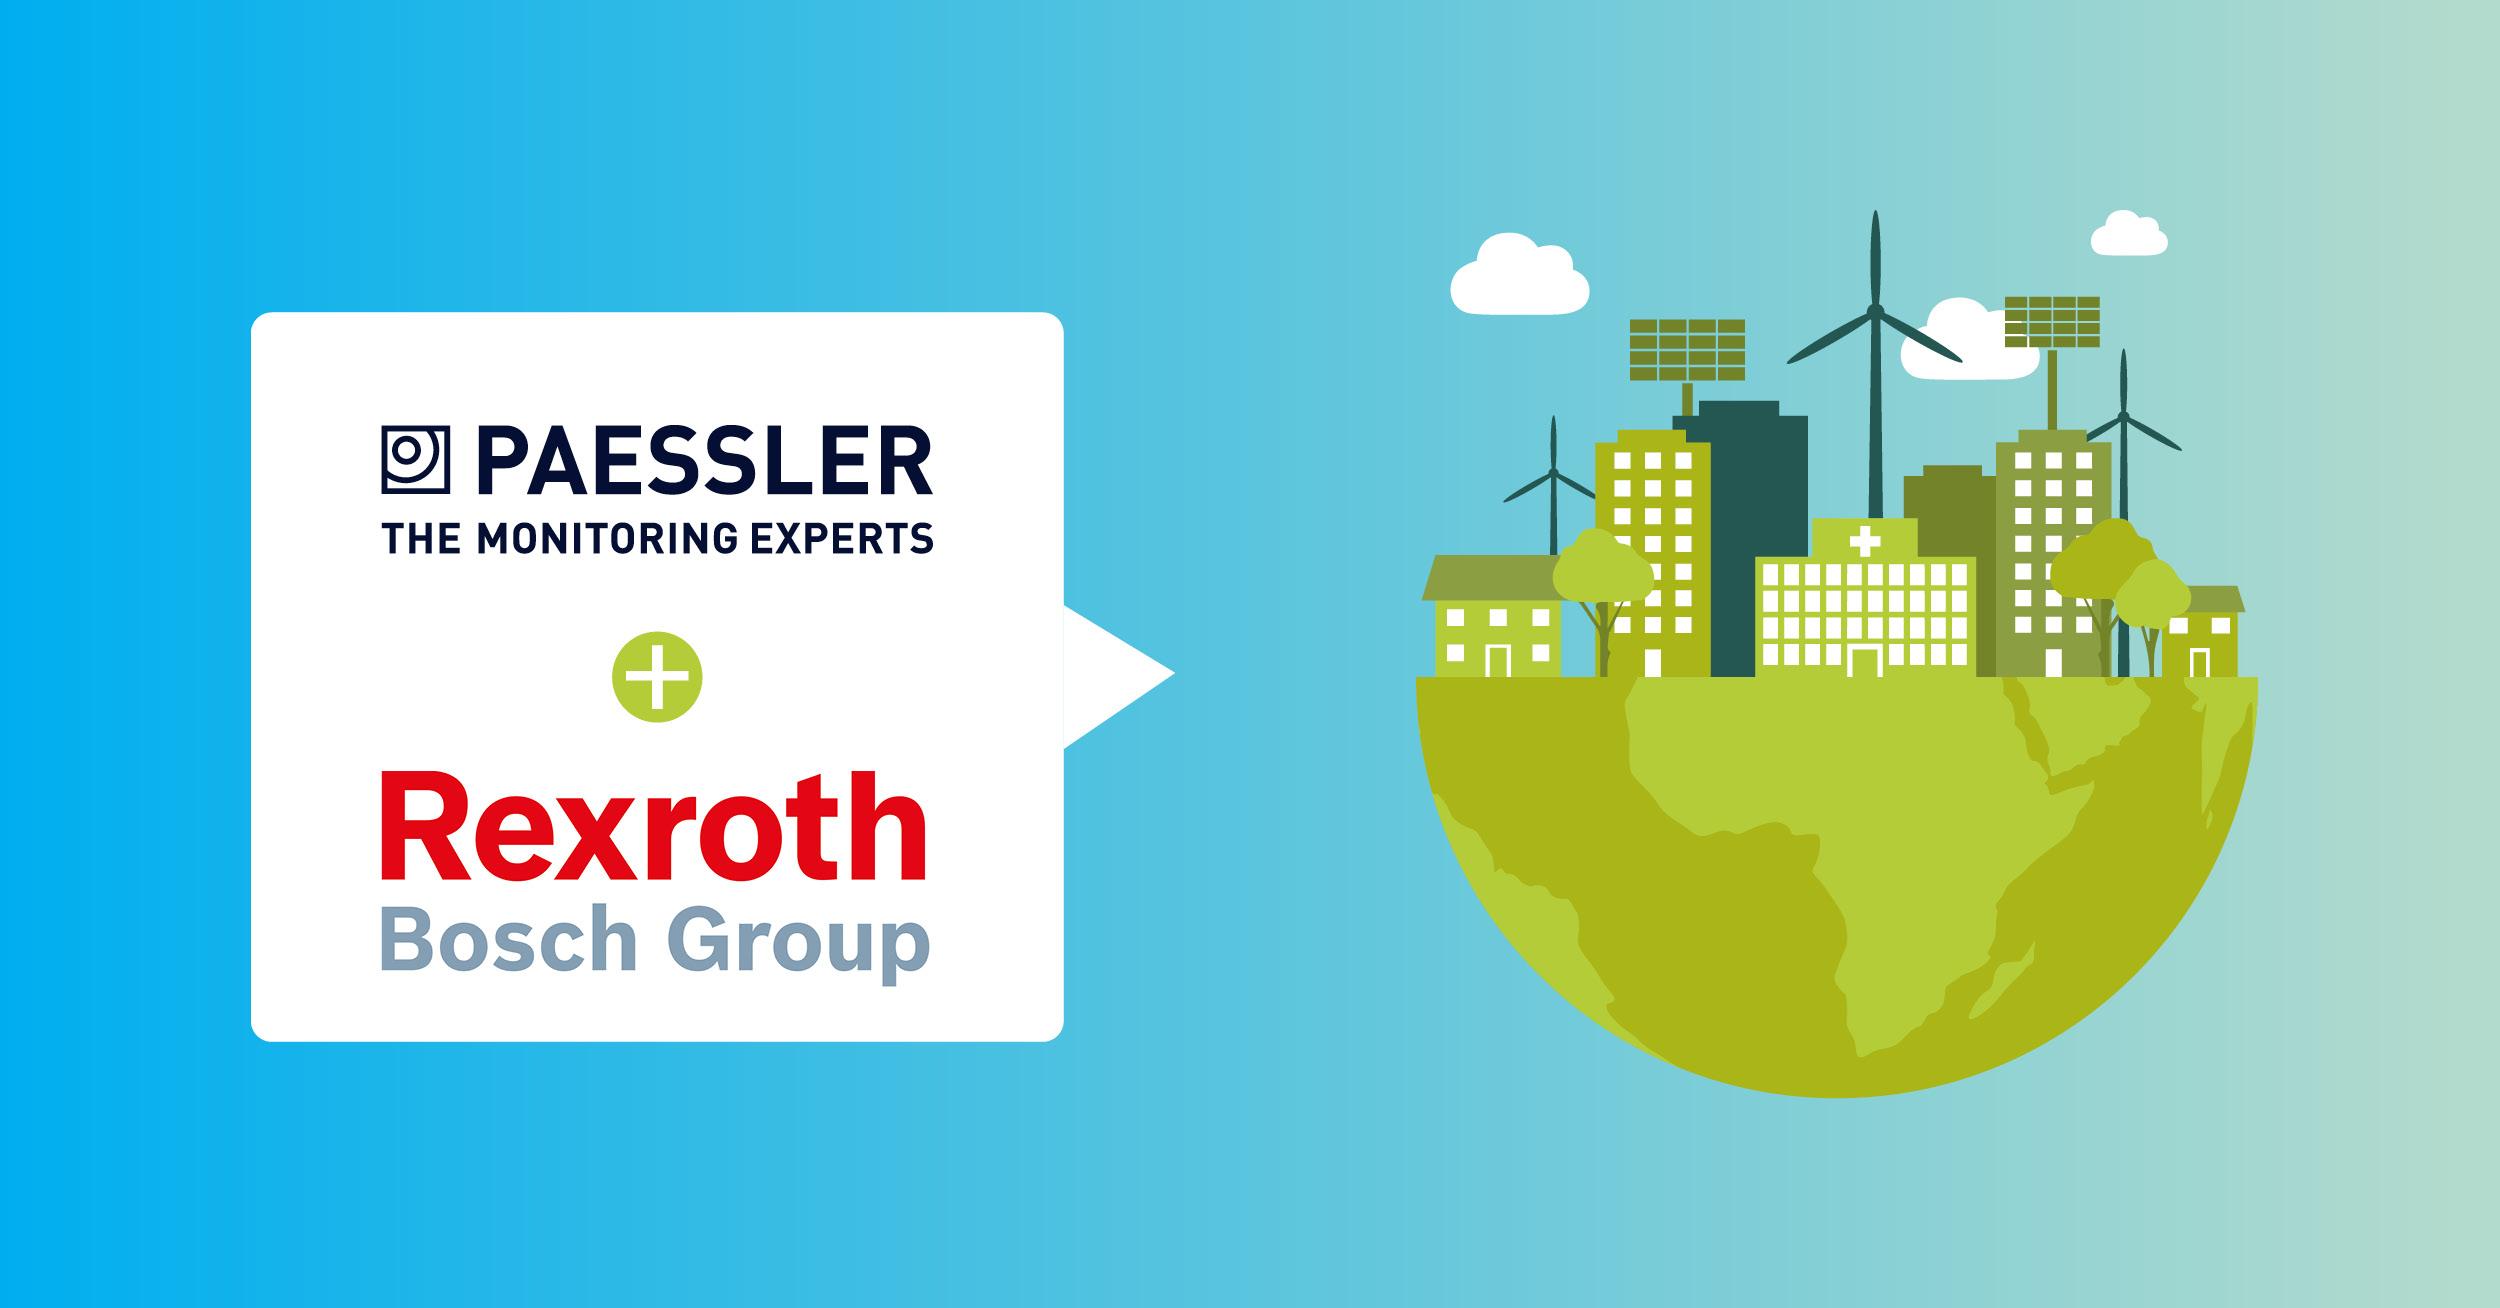 PRTG supports intelligent manufacturing at Bosch Rexroth